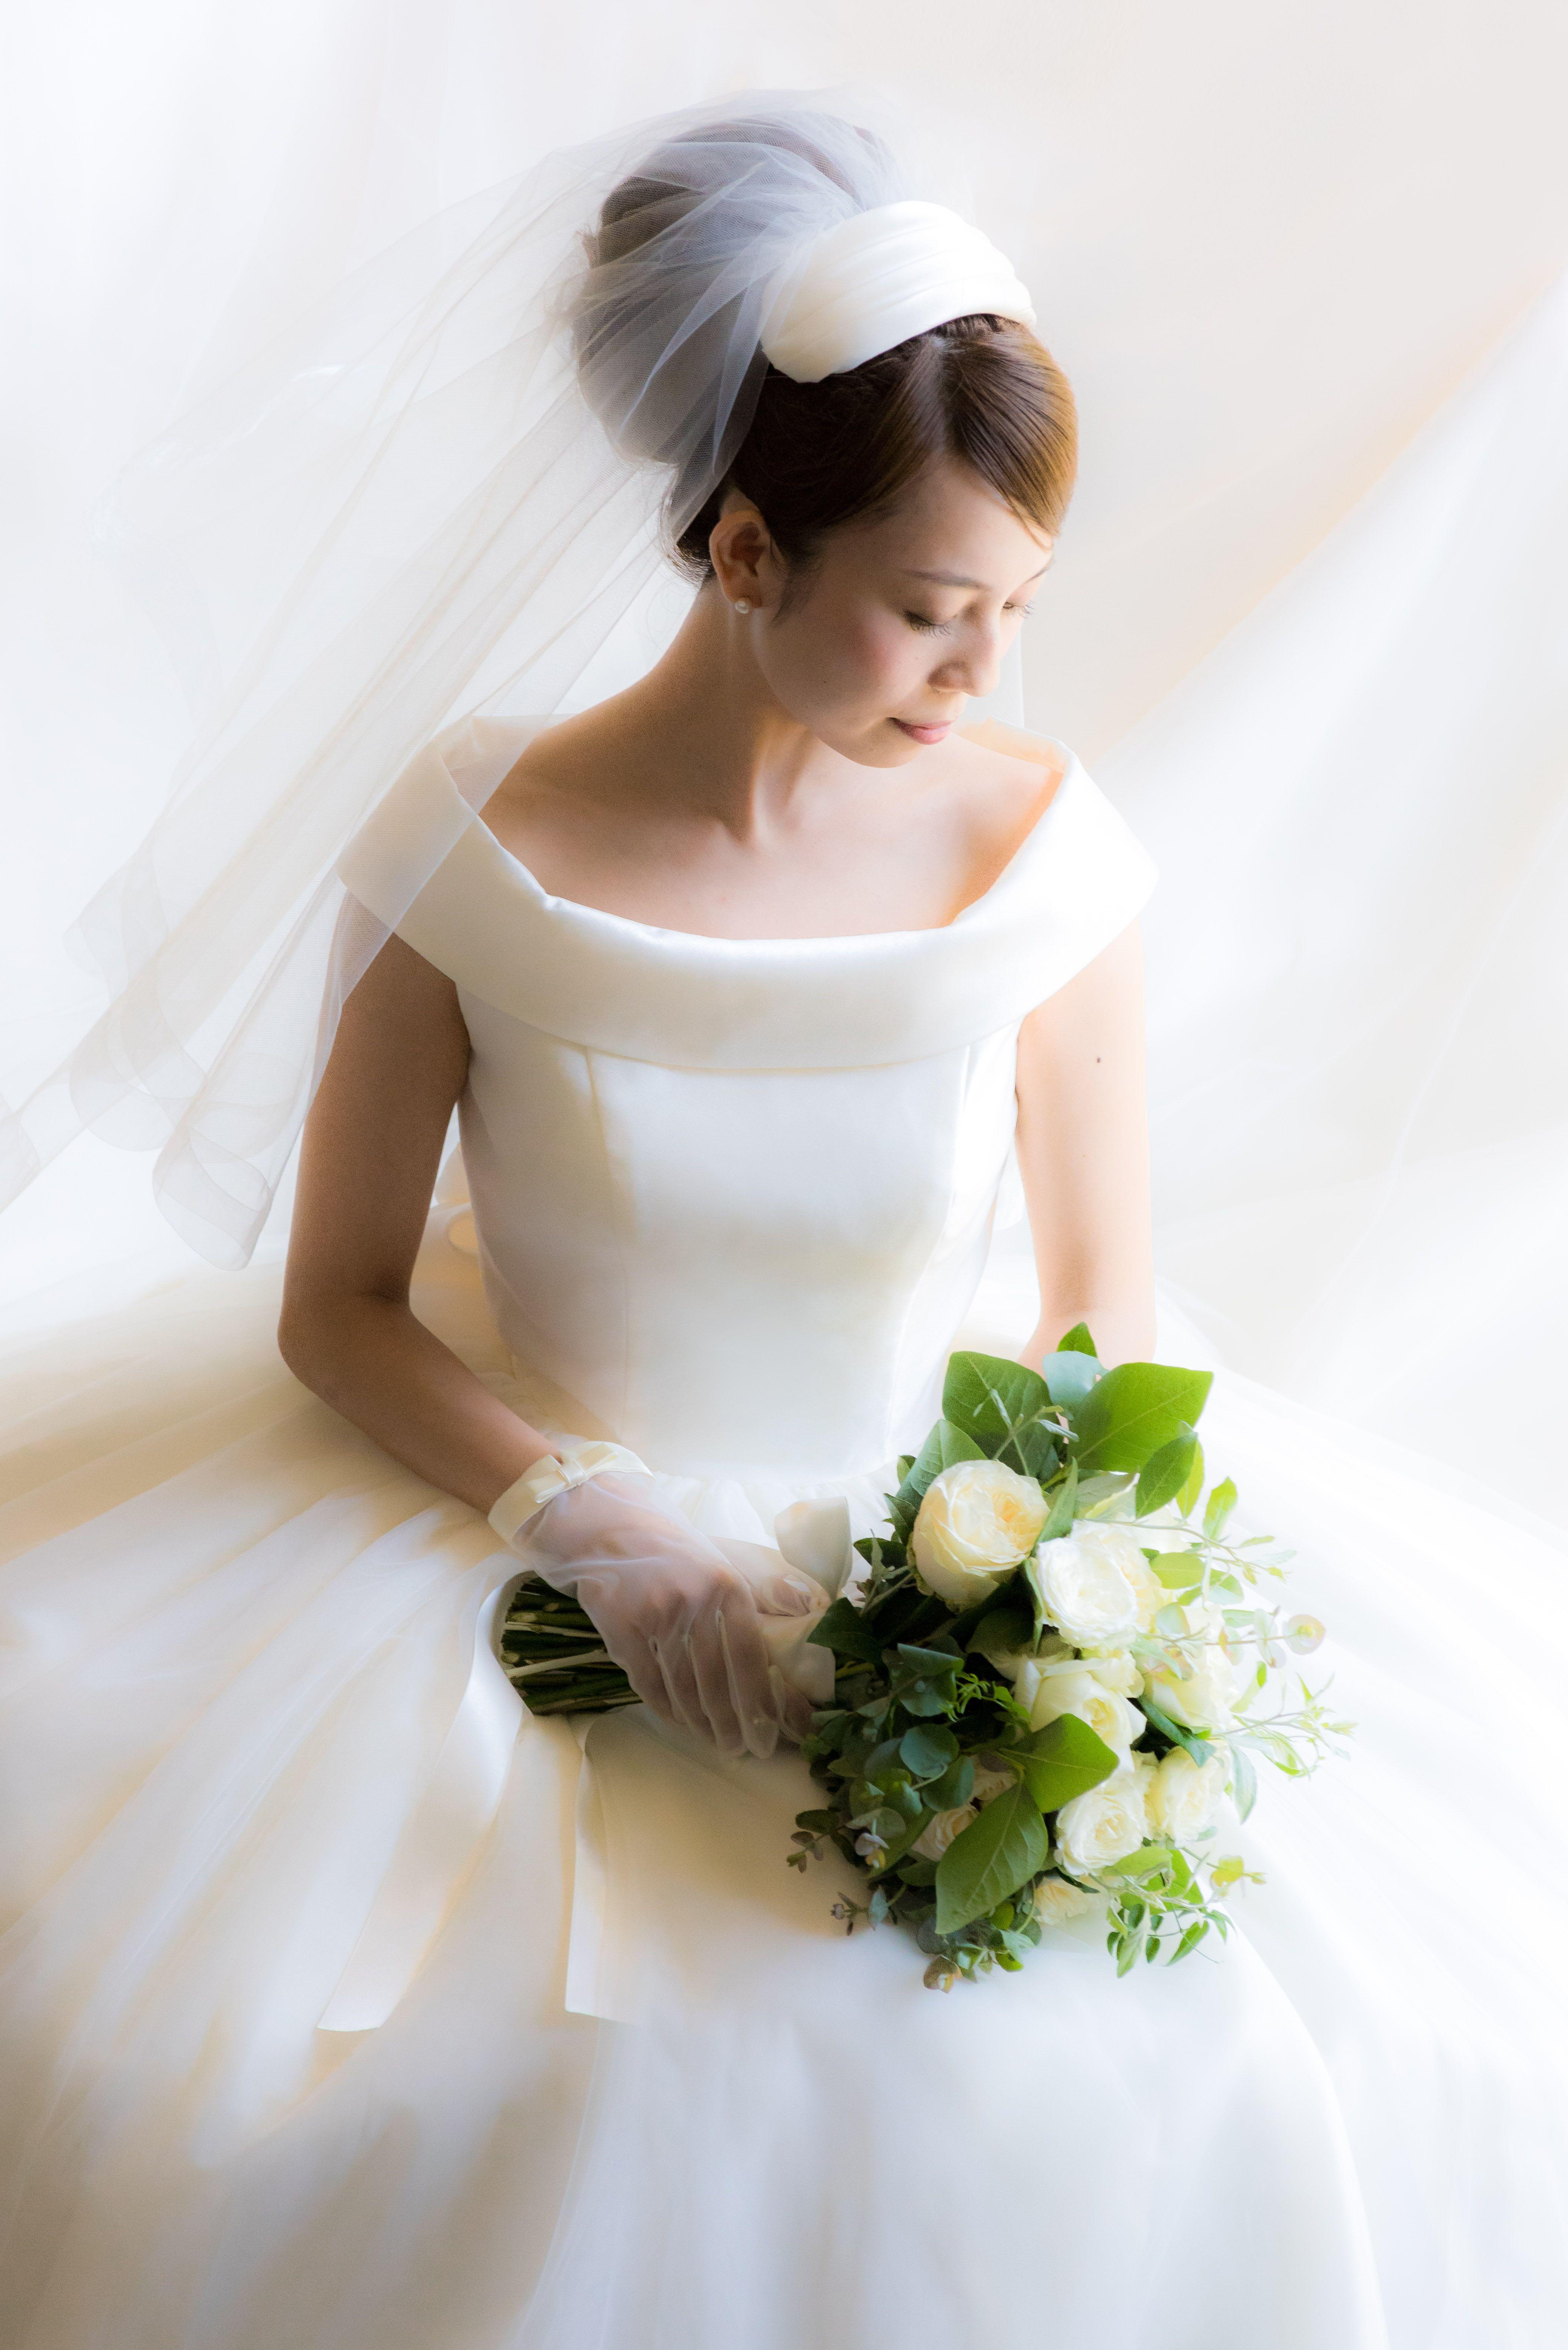 e5 a4 a7 e8 a5 bf e6 a7 98 ef bc 94 dream wedding in 2018